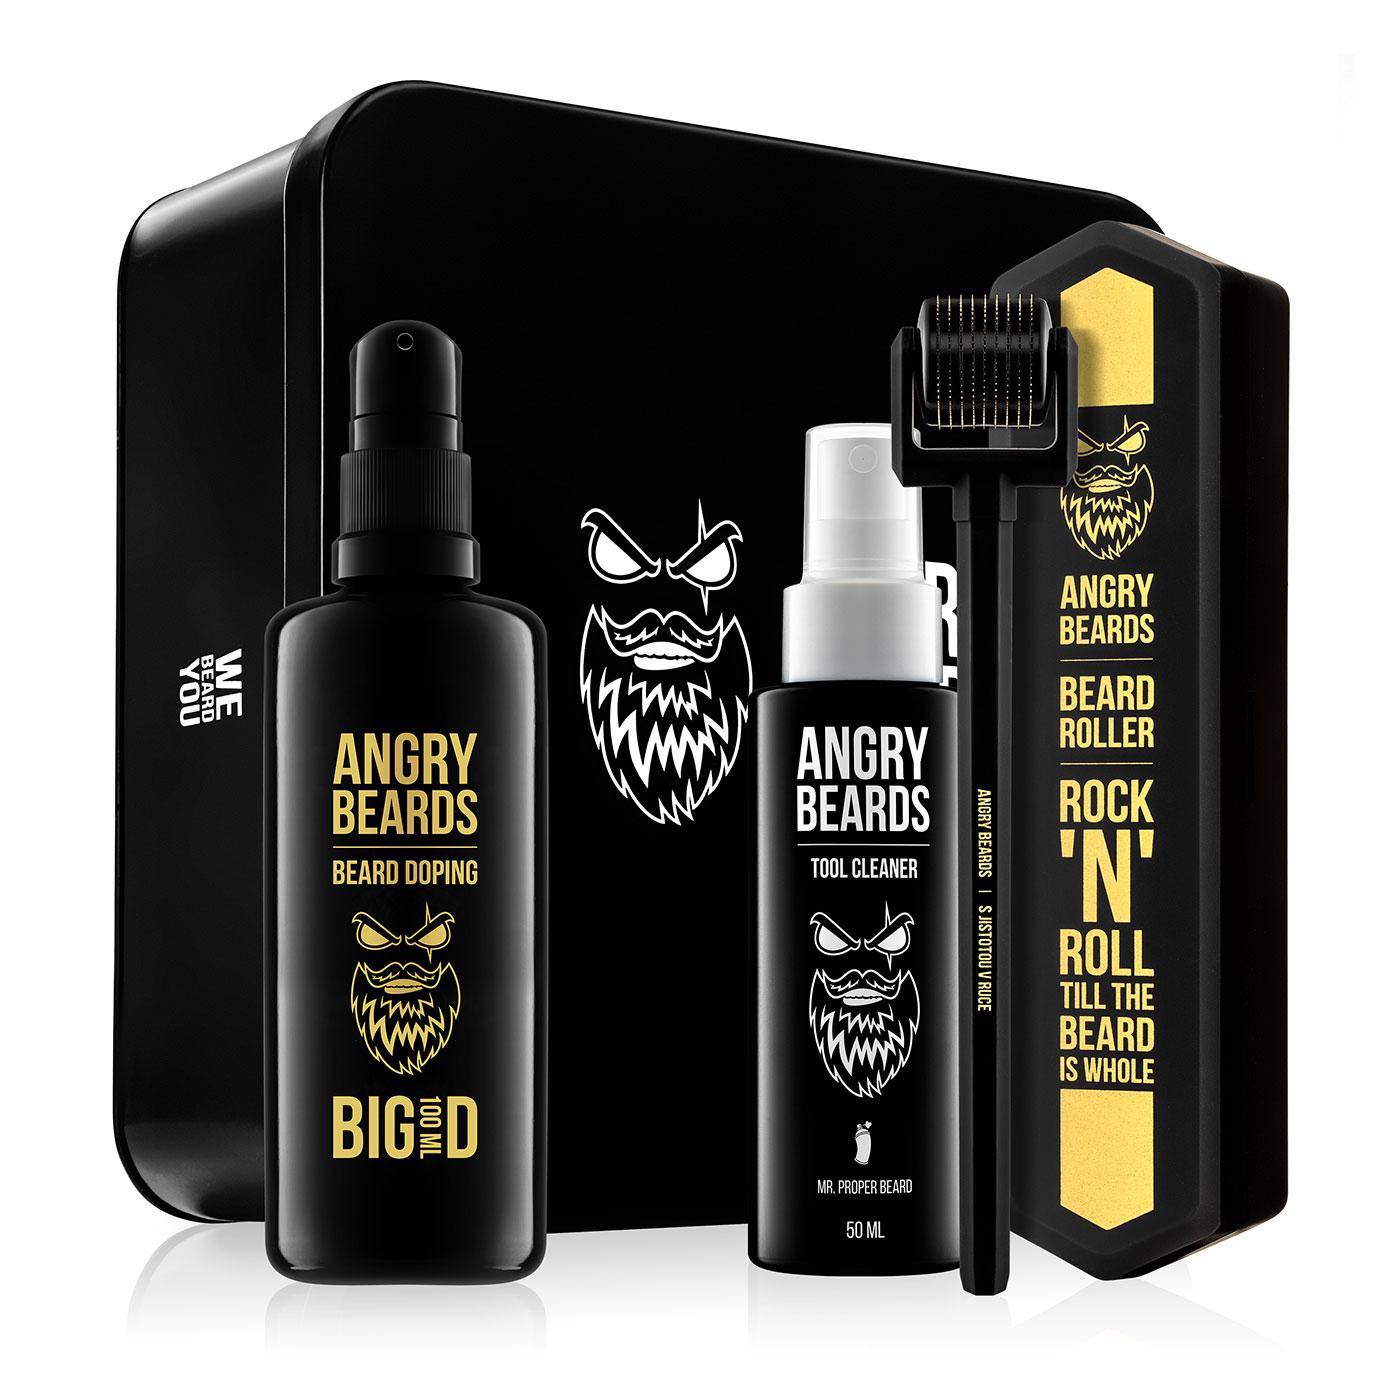 angry-beards-gift-box-p4-02-1400px